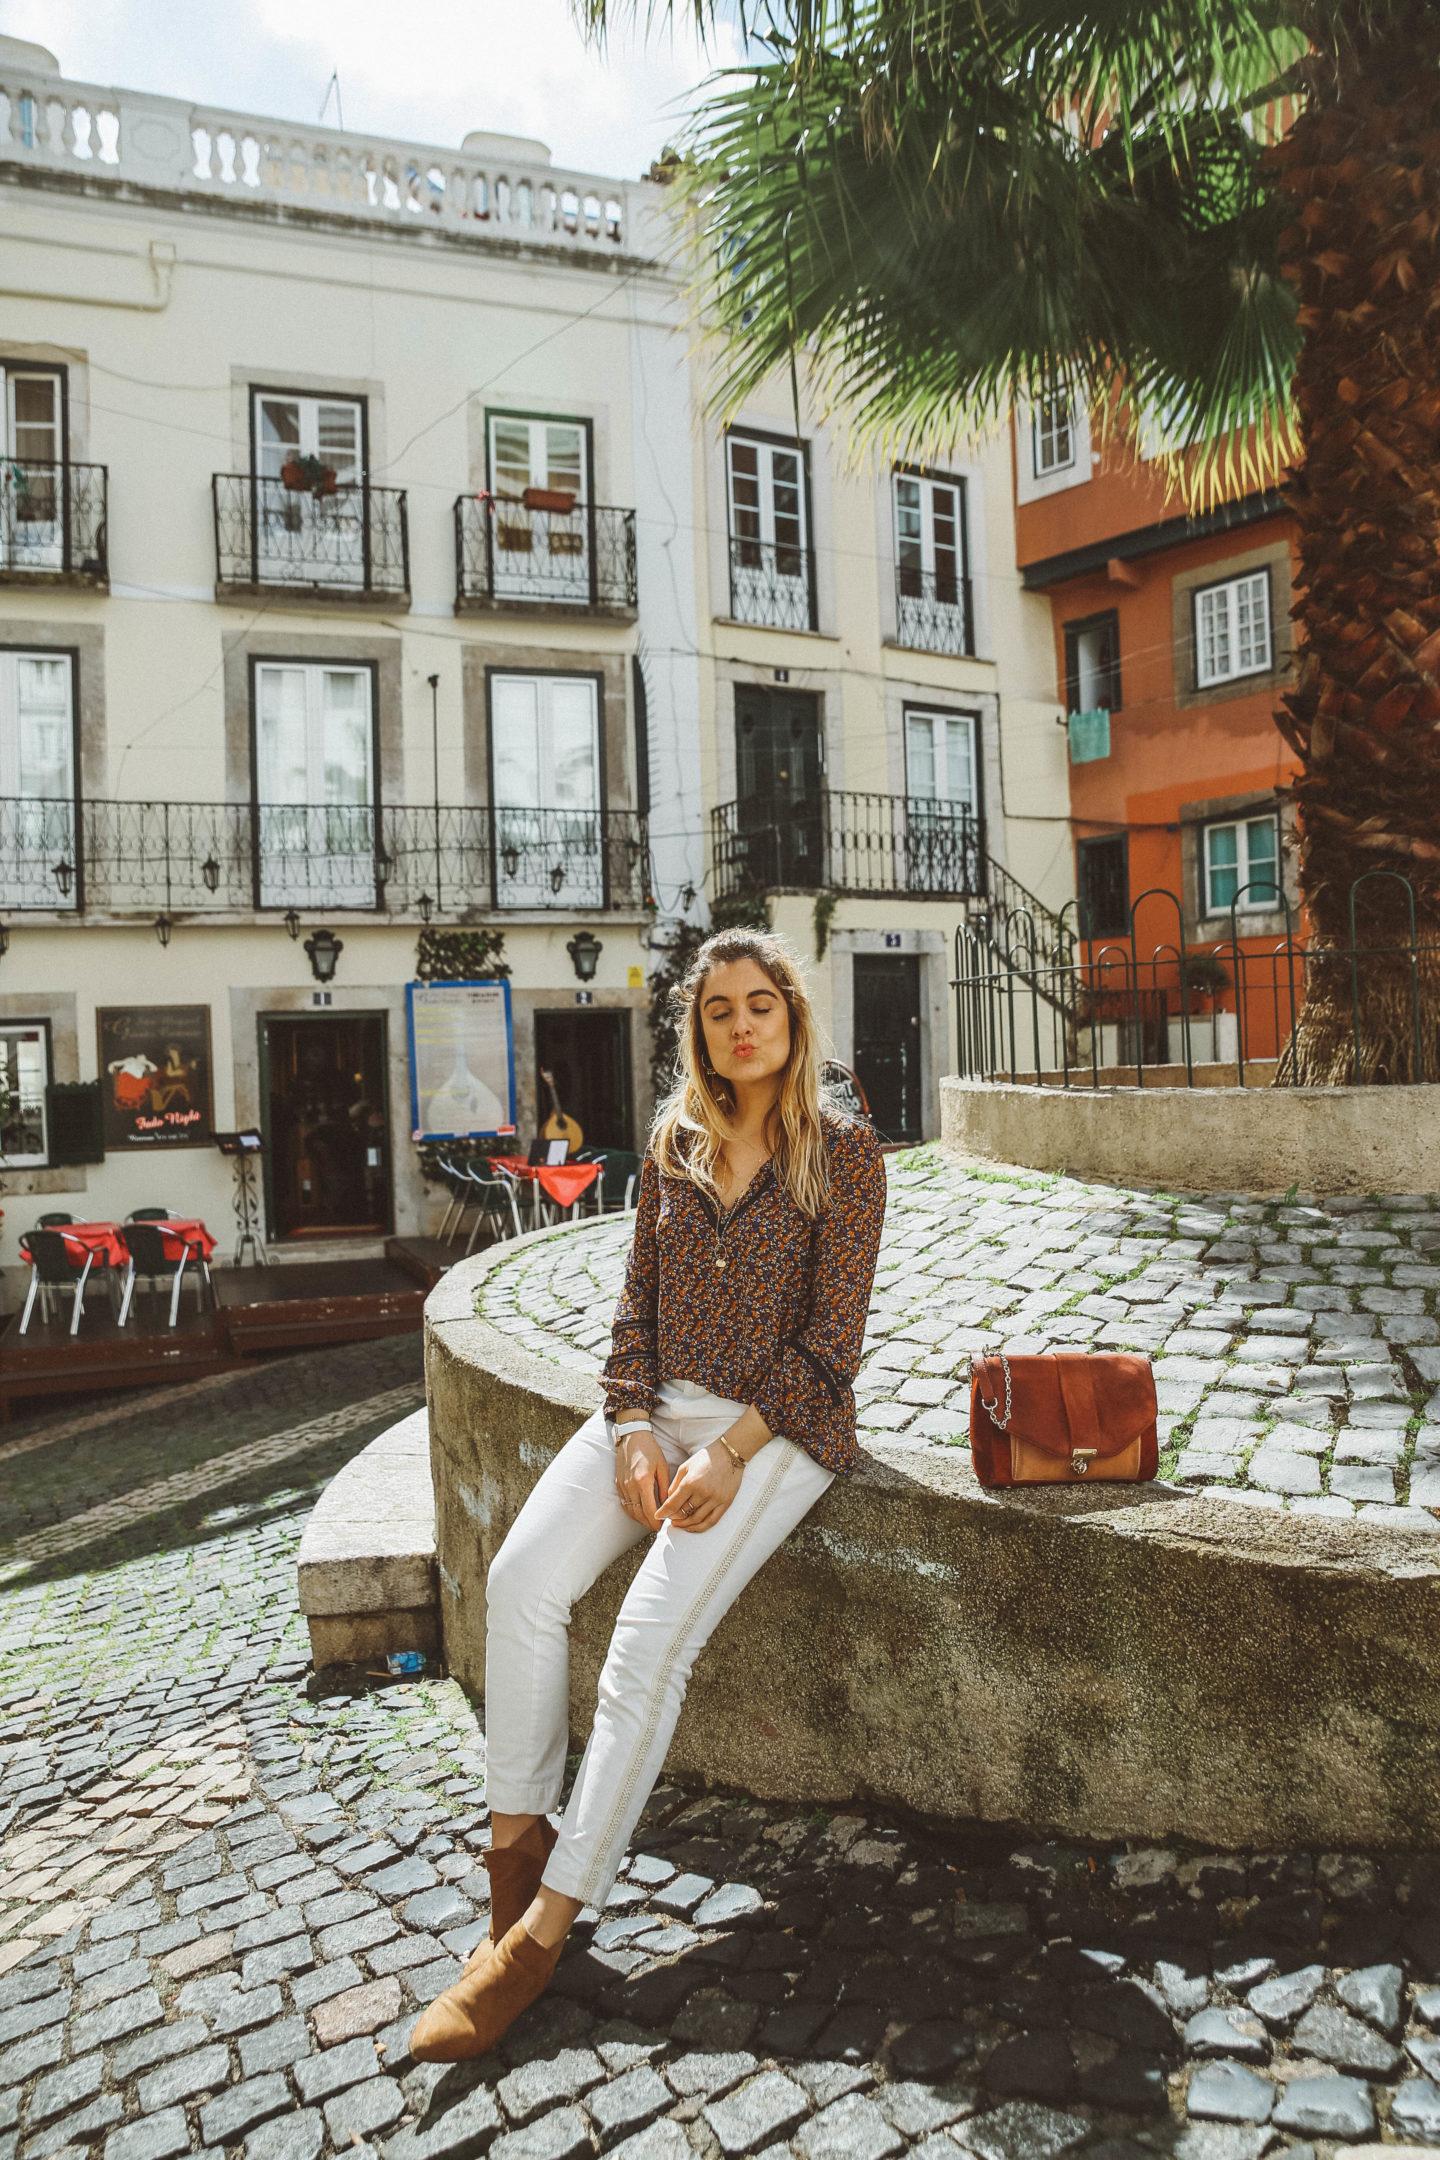 Sac Tiger Sézane - Blondie Baby blog mode Paris et voyages